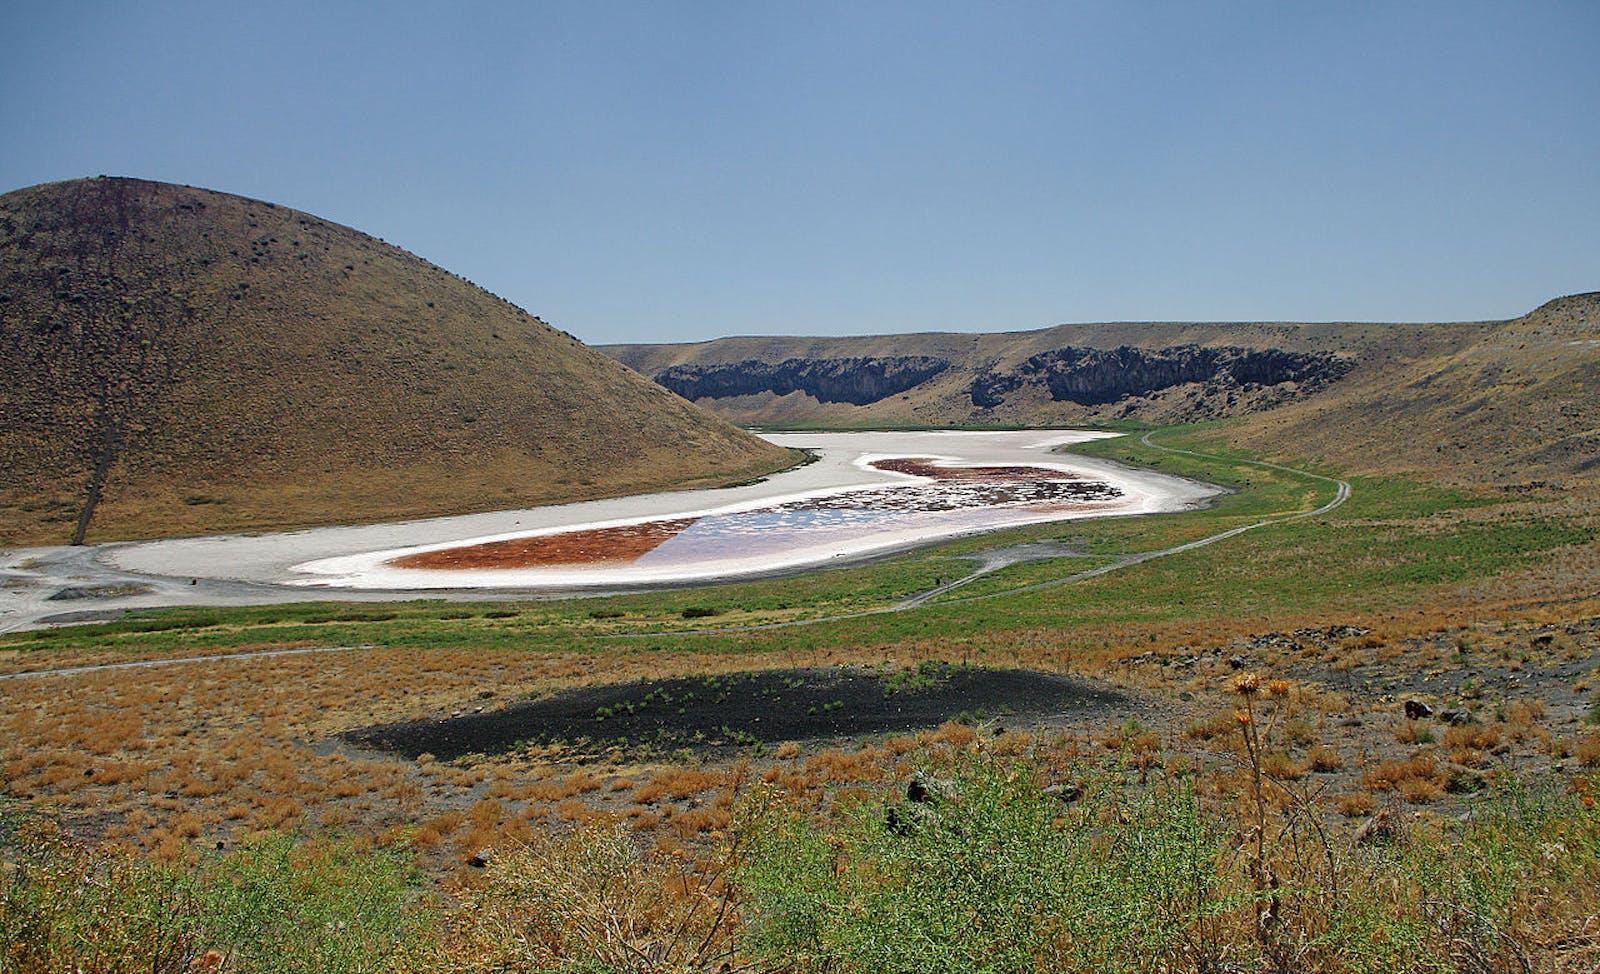 Central Anatolian Steppe